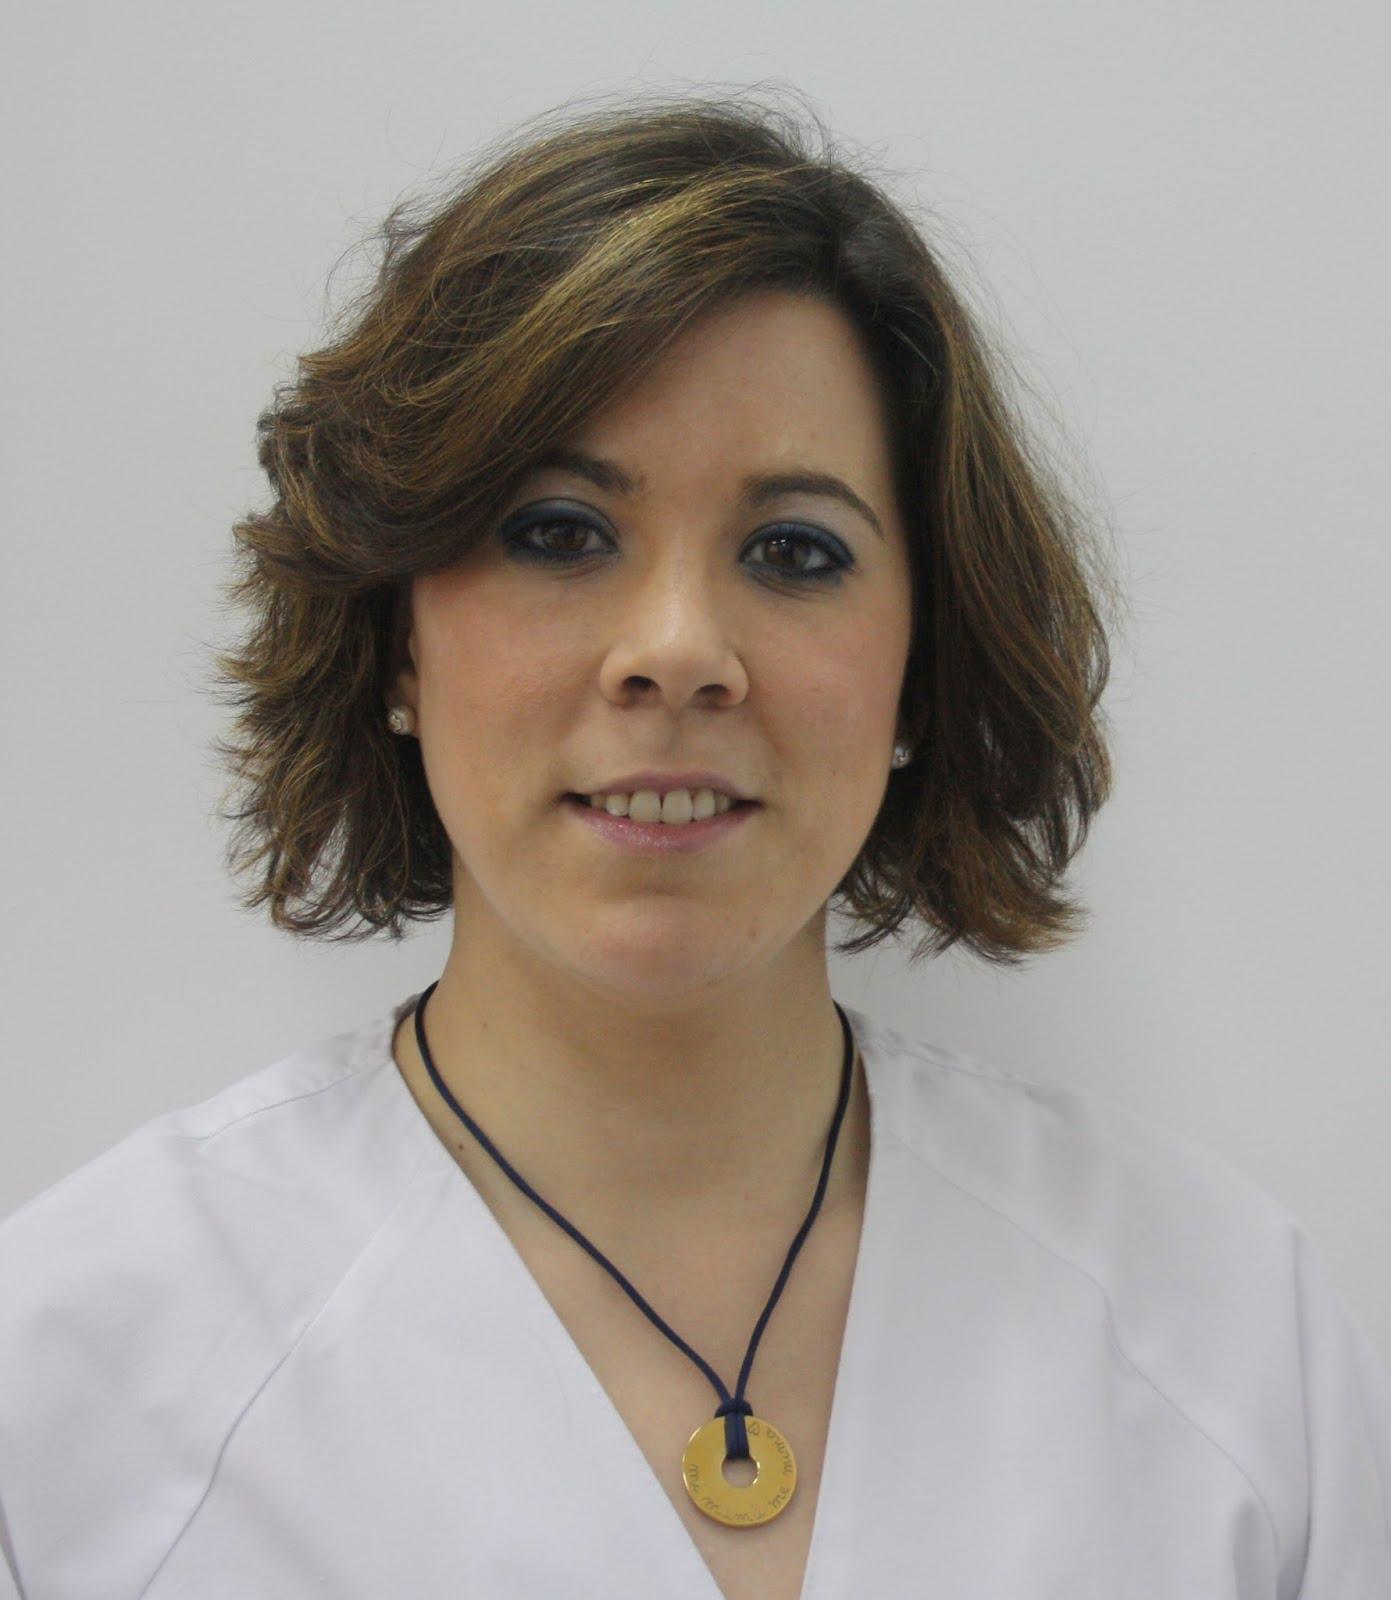 María Cedenilla Juárez Fisioterapeuta/Osteópata C.O